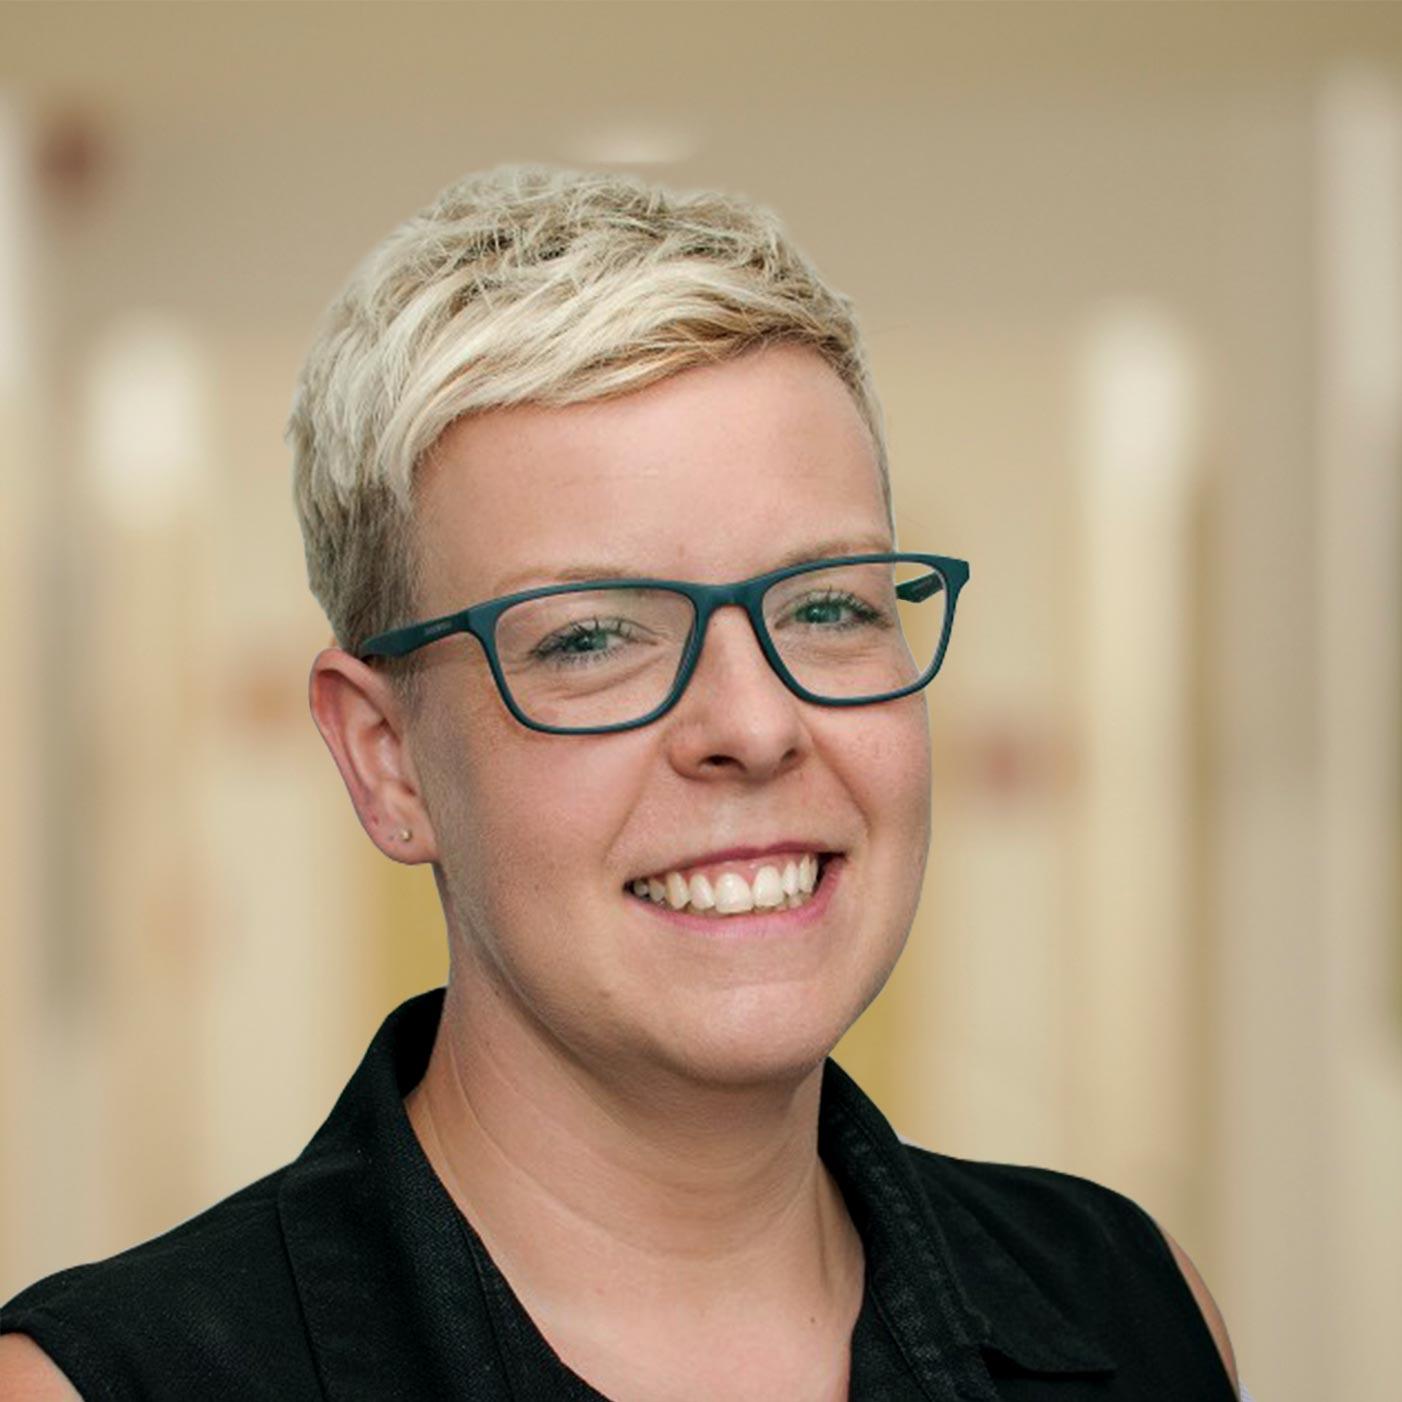 Katrin Wedler